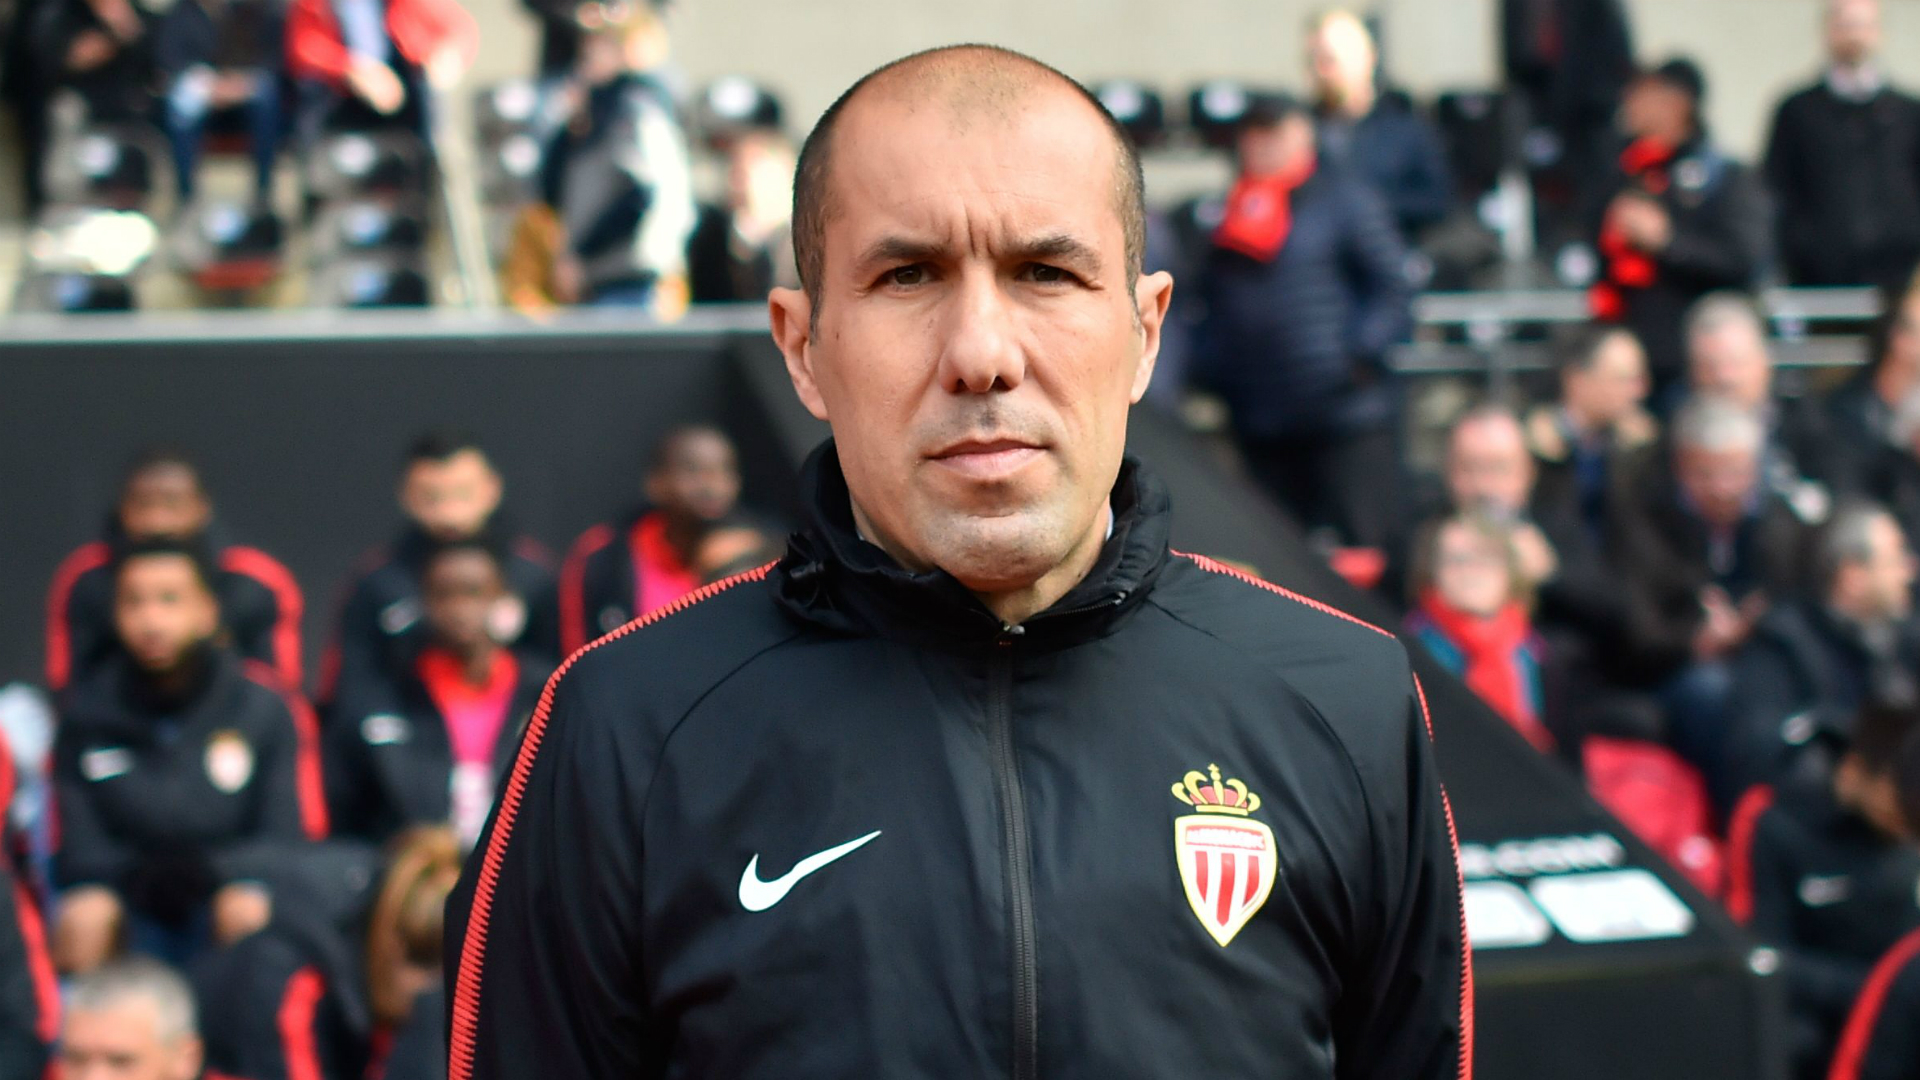 Arsenal Manager News Monaco Boss Leonardo Jardim One Of The Best In The World Rony Lopes Goal Com